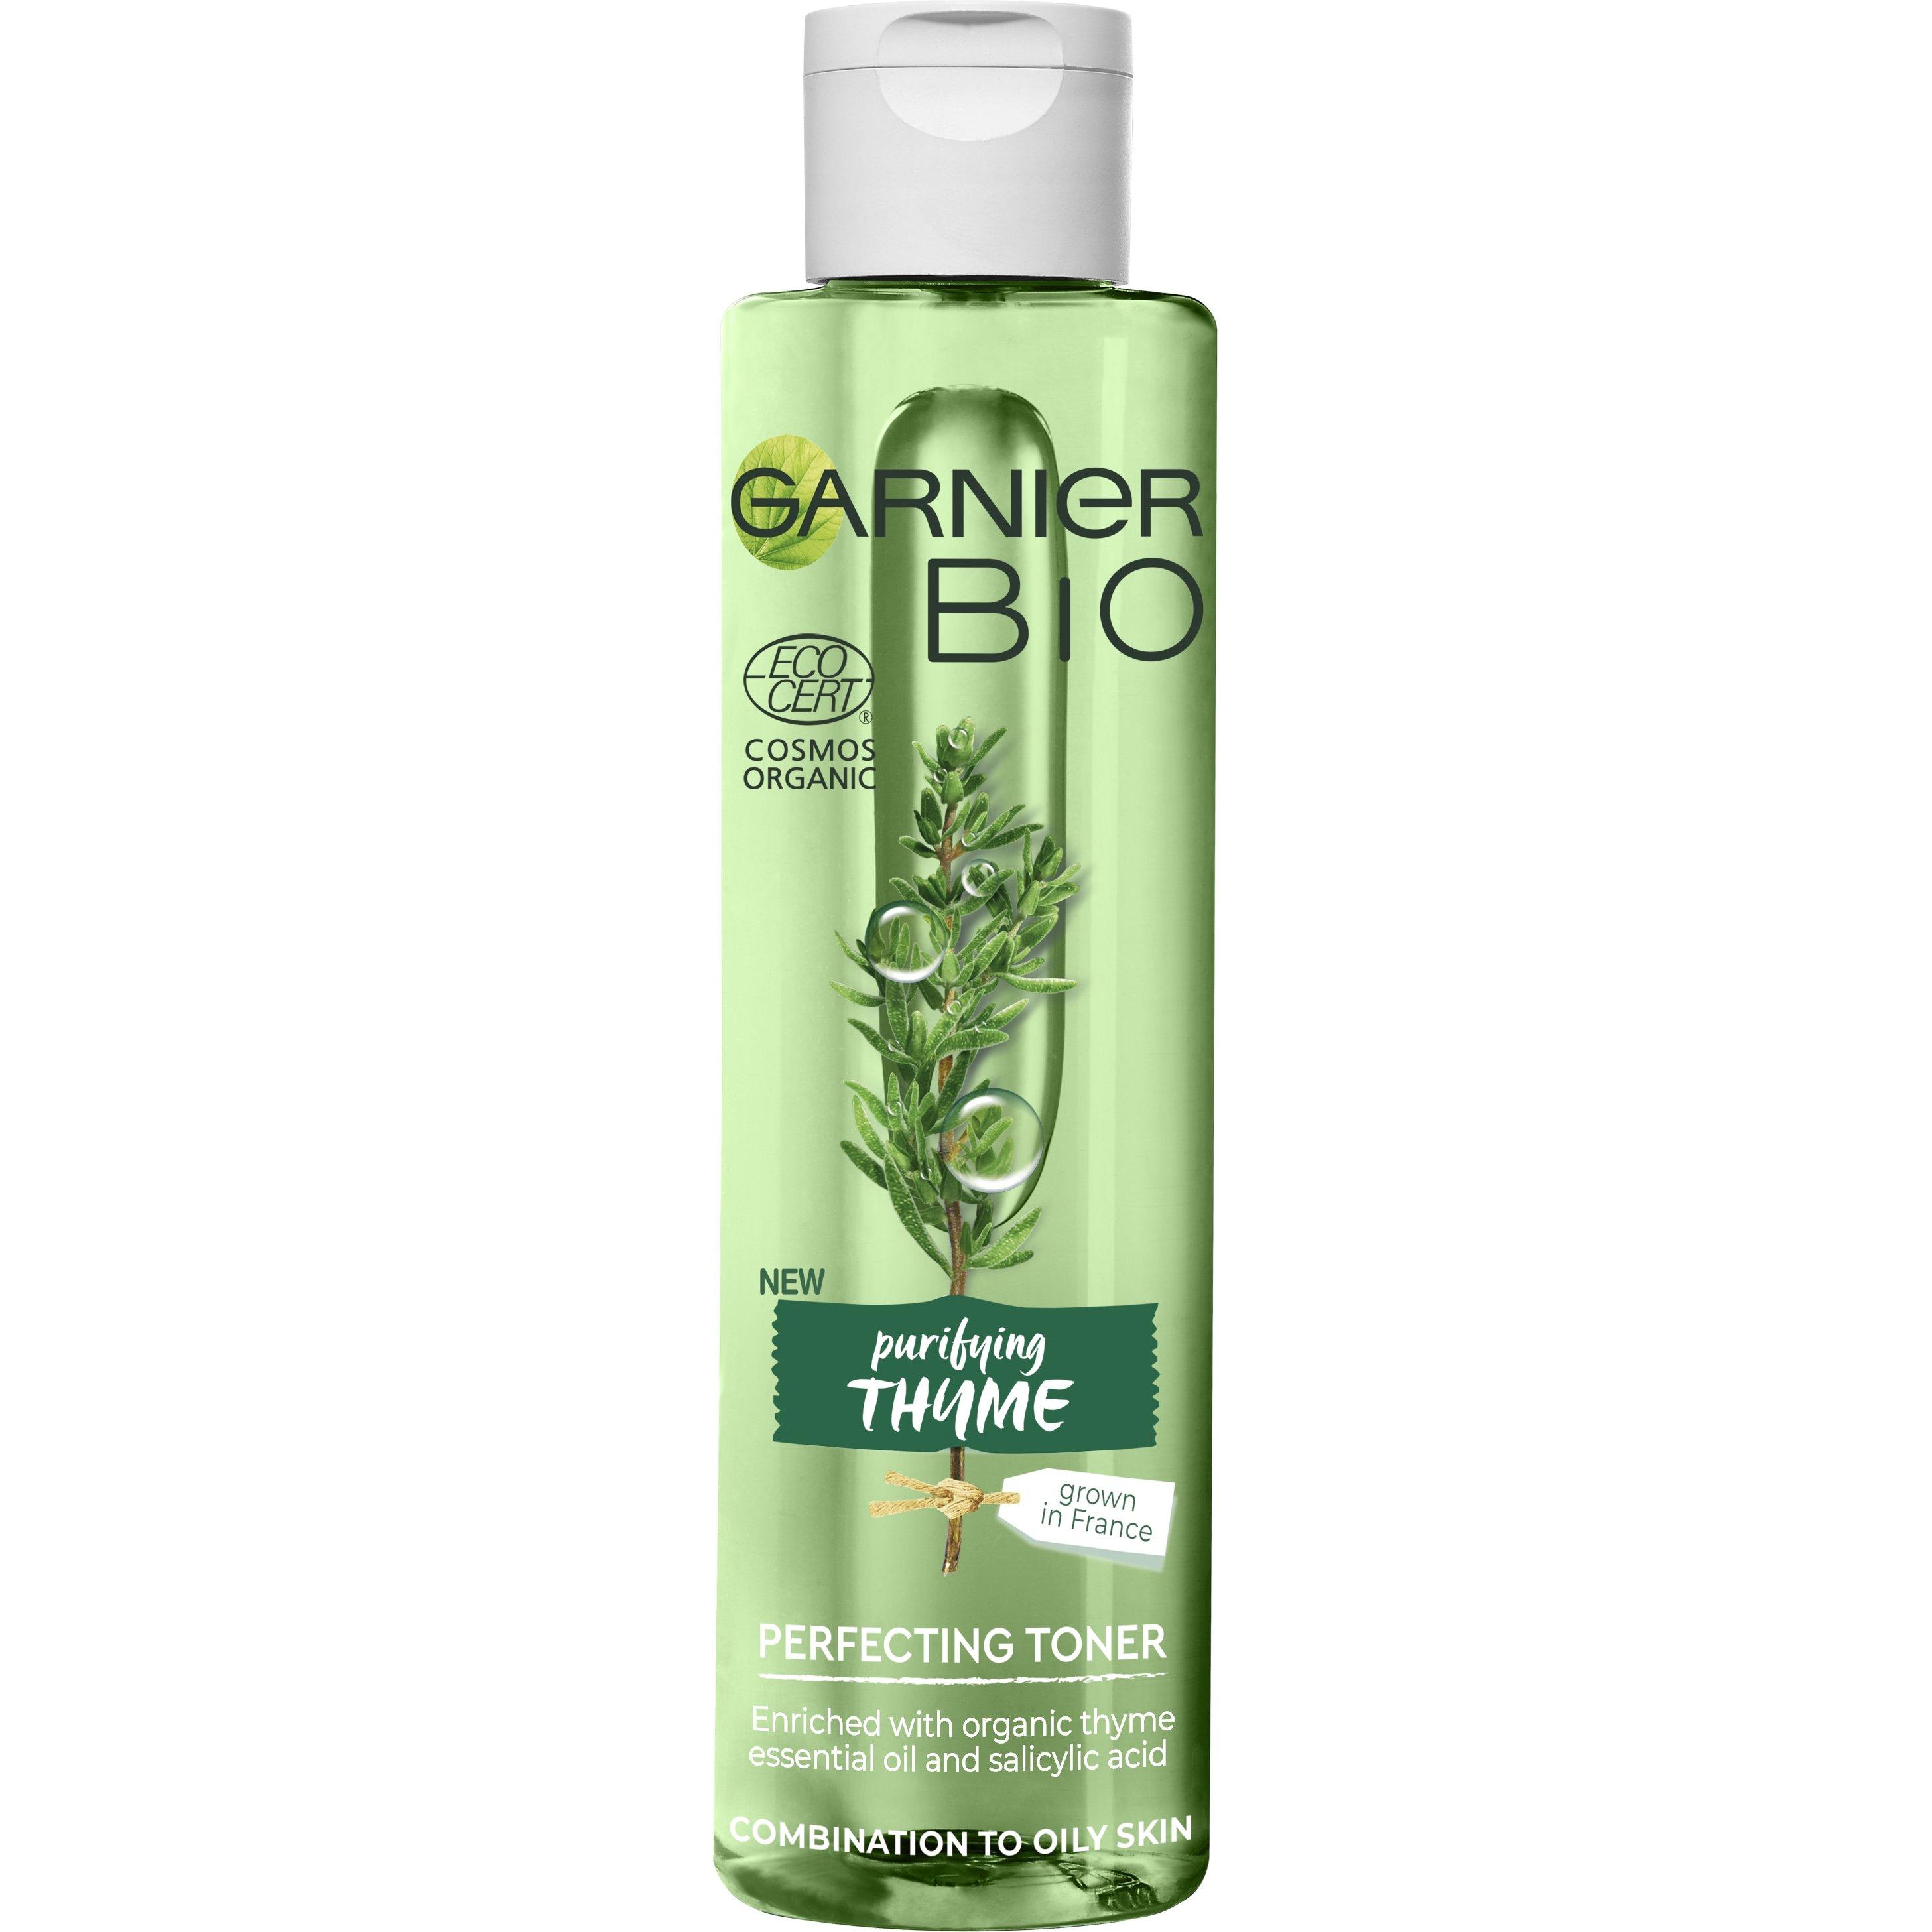 Garnier Bio Purifying Thyme Perfecting Toner Τονωτική Λοσιόν Προσώπου με Αιθέριο Έλαιο Βιολογικού Θυμαριού 150ml